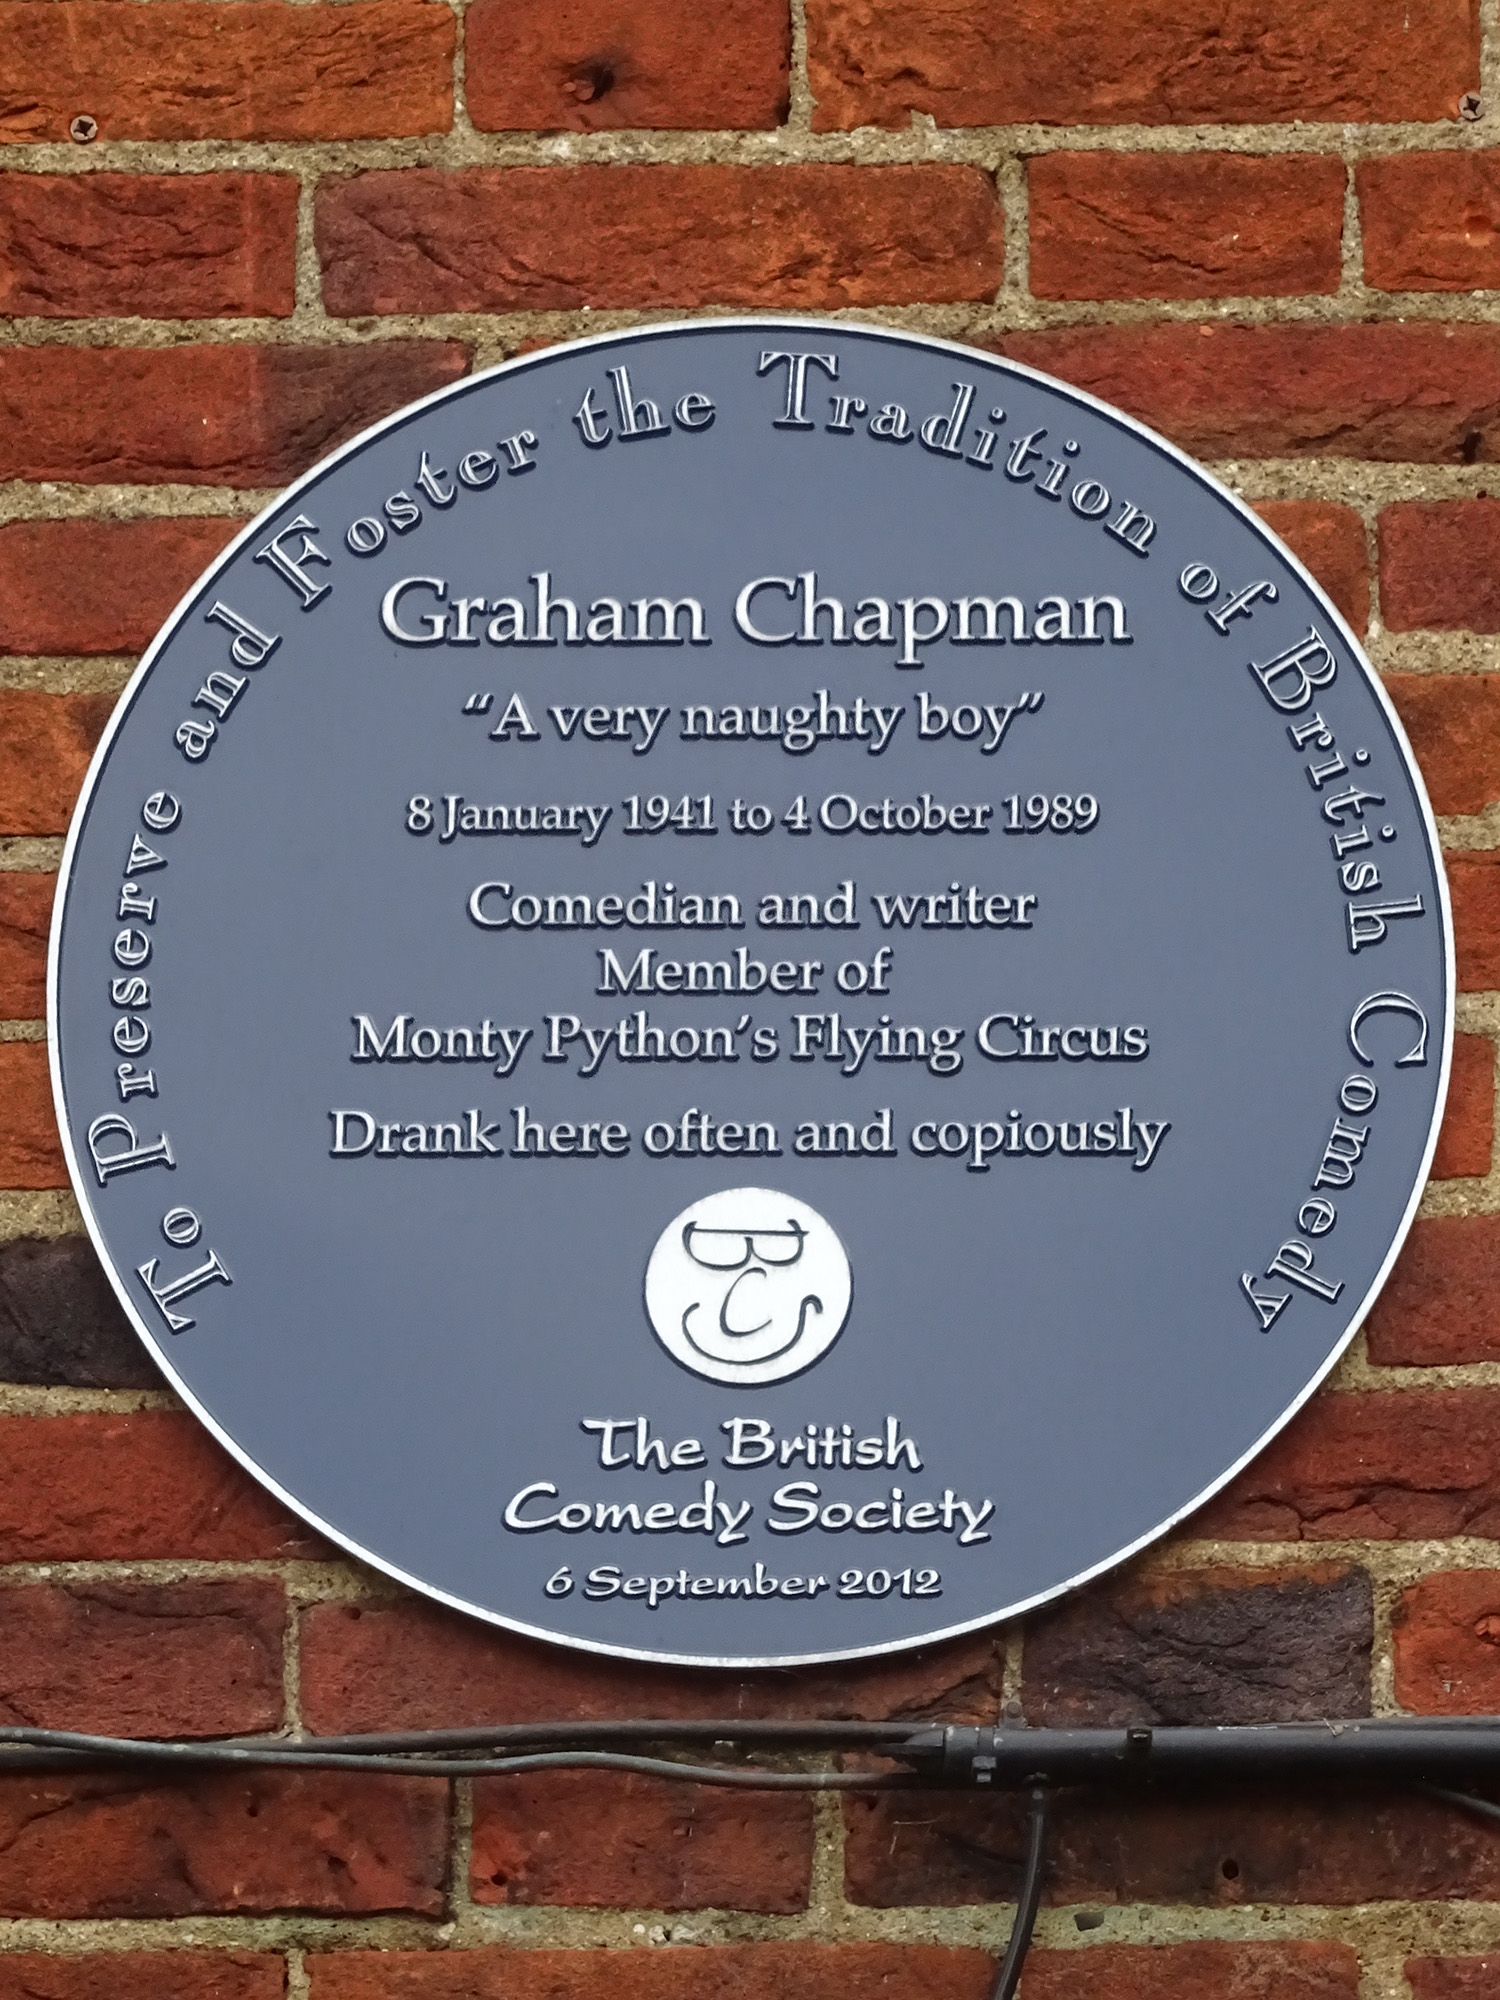 Photo Graham Chapman via Opendata BNF